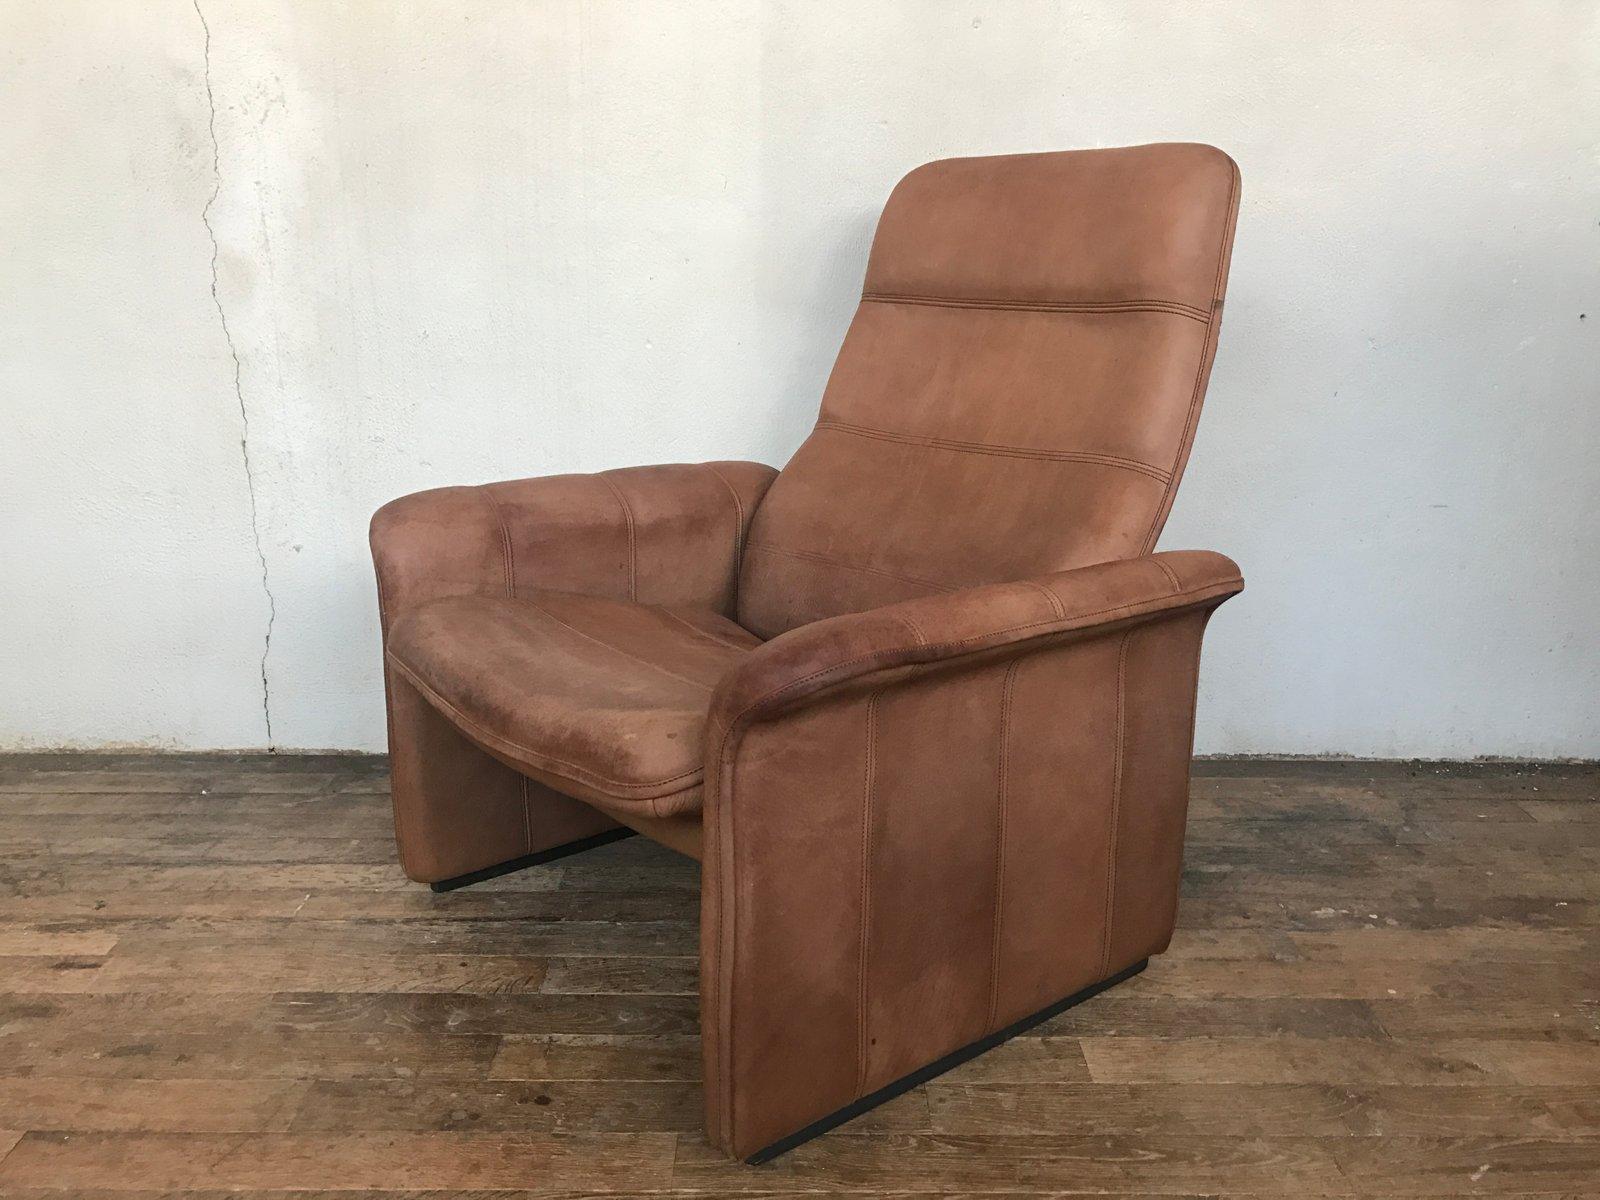 ds 50 b ffelleder sessel von de sede 1960er bei pamono kaufen. Black Bedroom Furniture Sets. Home Design Ideas